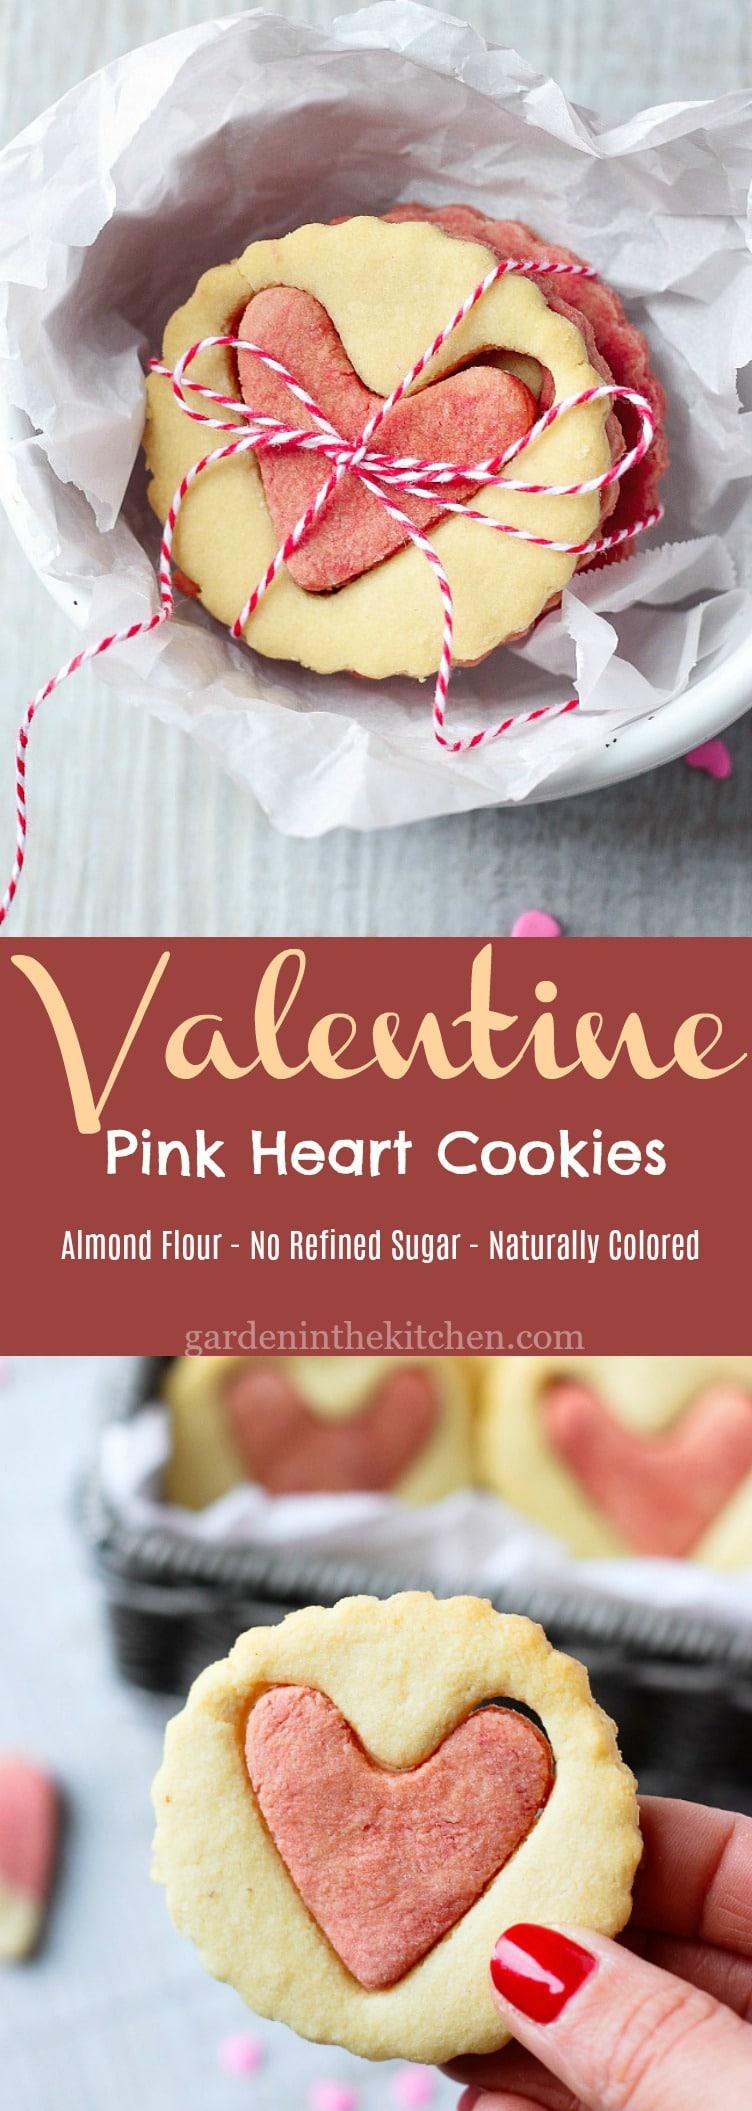 Heart Centered Valentine Pink Heart Cookies! #valentinesday #valentinesdaycookies #bemine #cookies